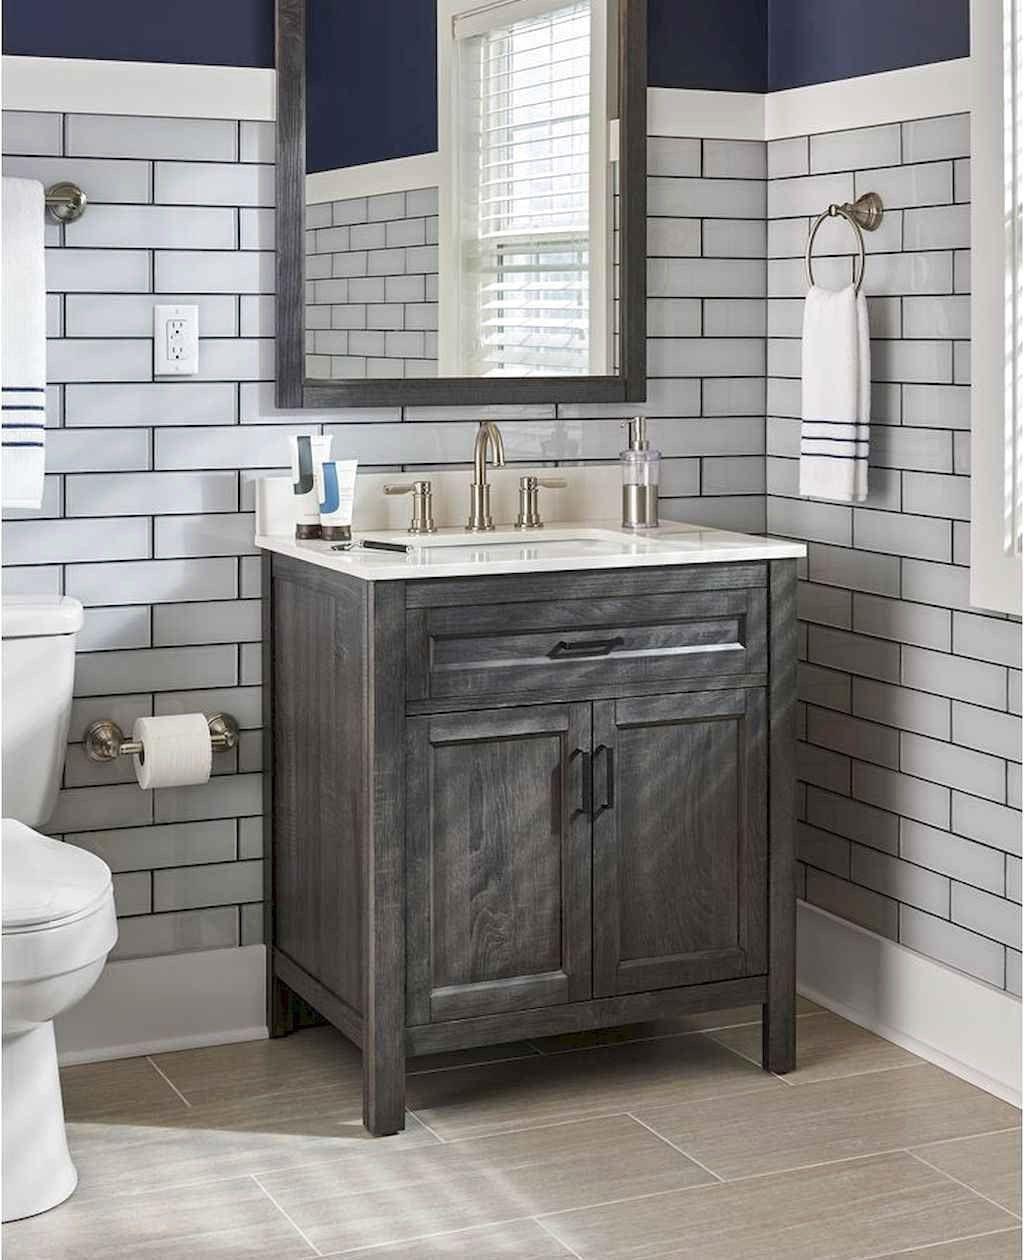 Amazing Farmhouse Bathroom Decor Ideas FRUGAL LIVING